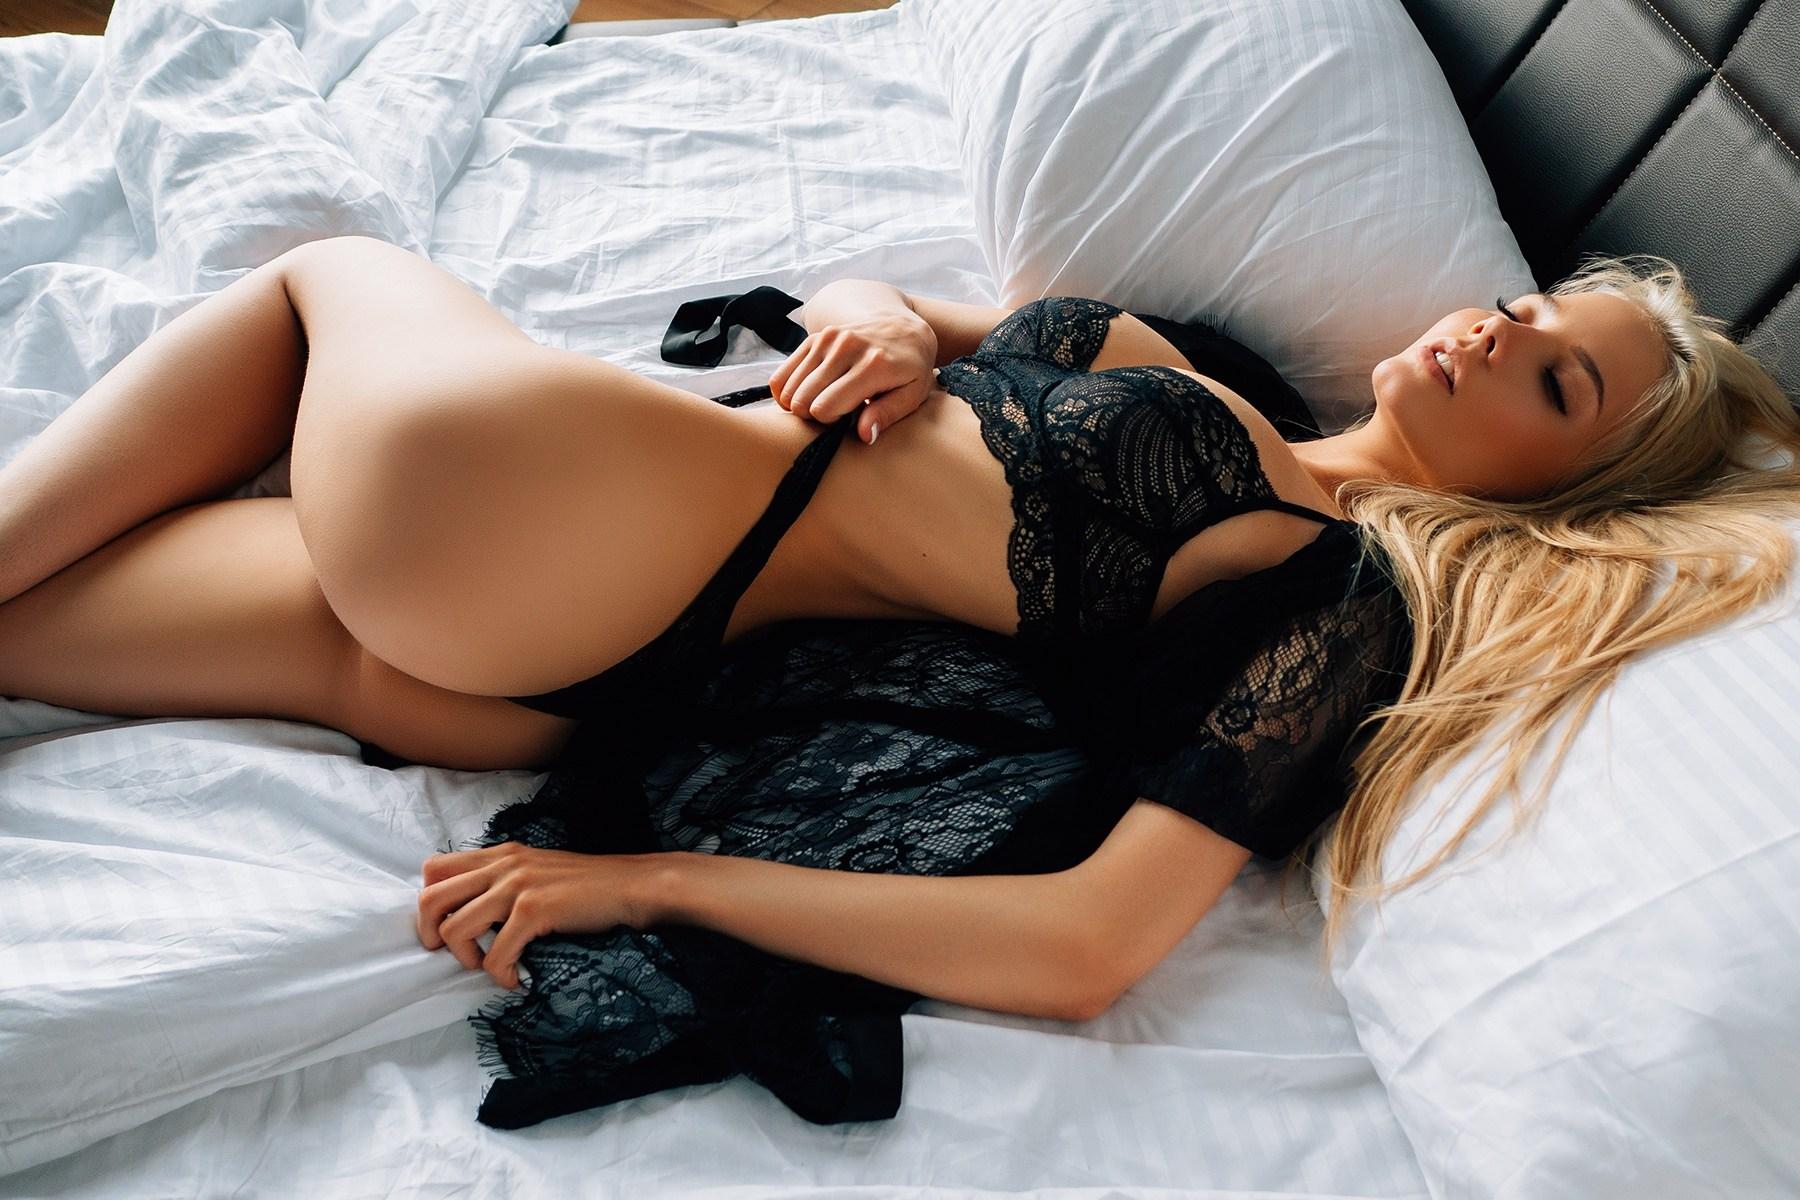 Katerina Chiriaeva by Aleksei Trifonov / Катерина Чиряева - фото Алексей Трифонов